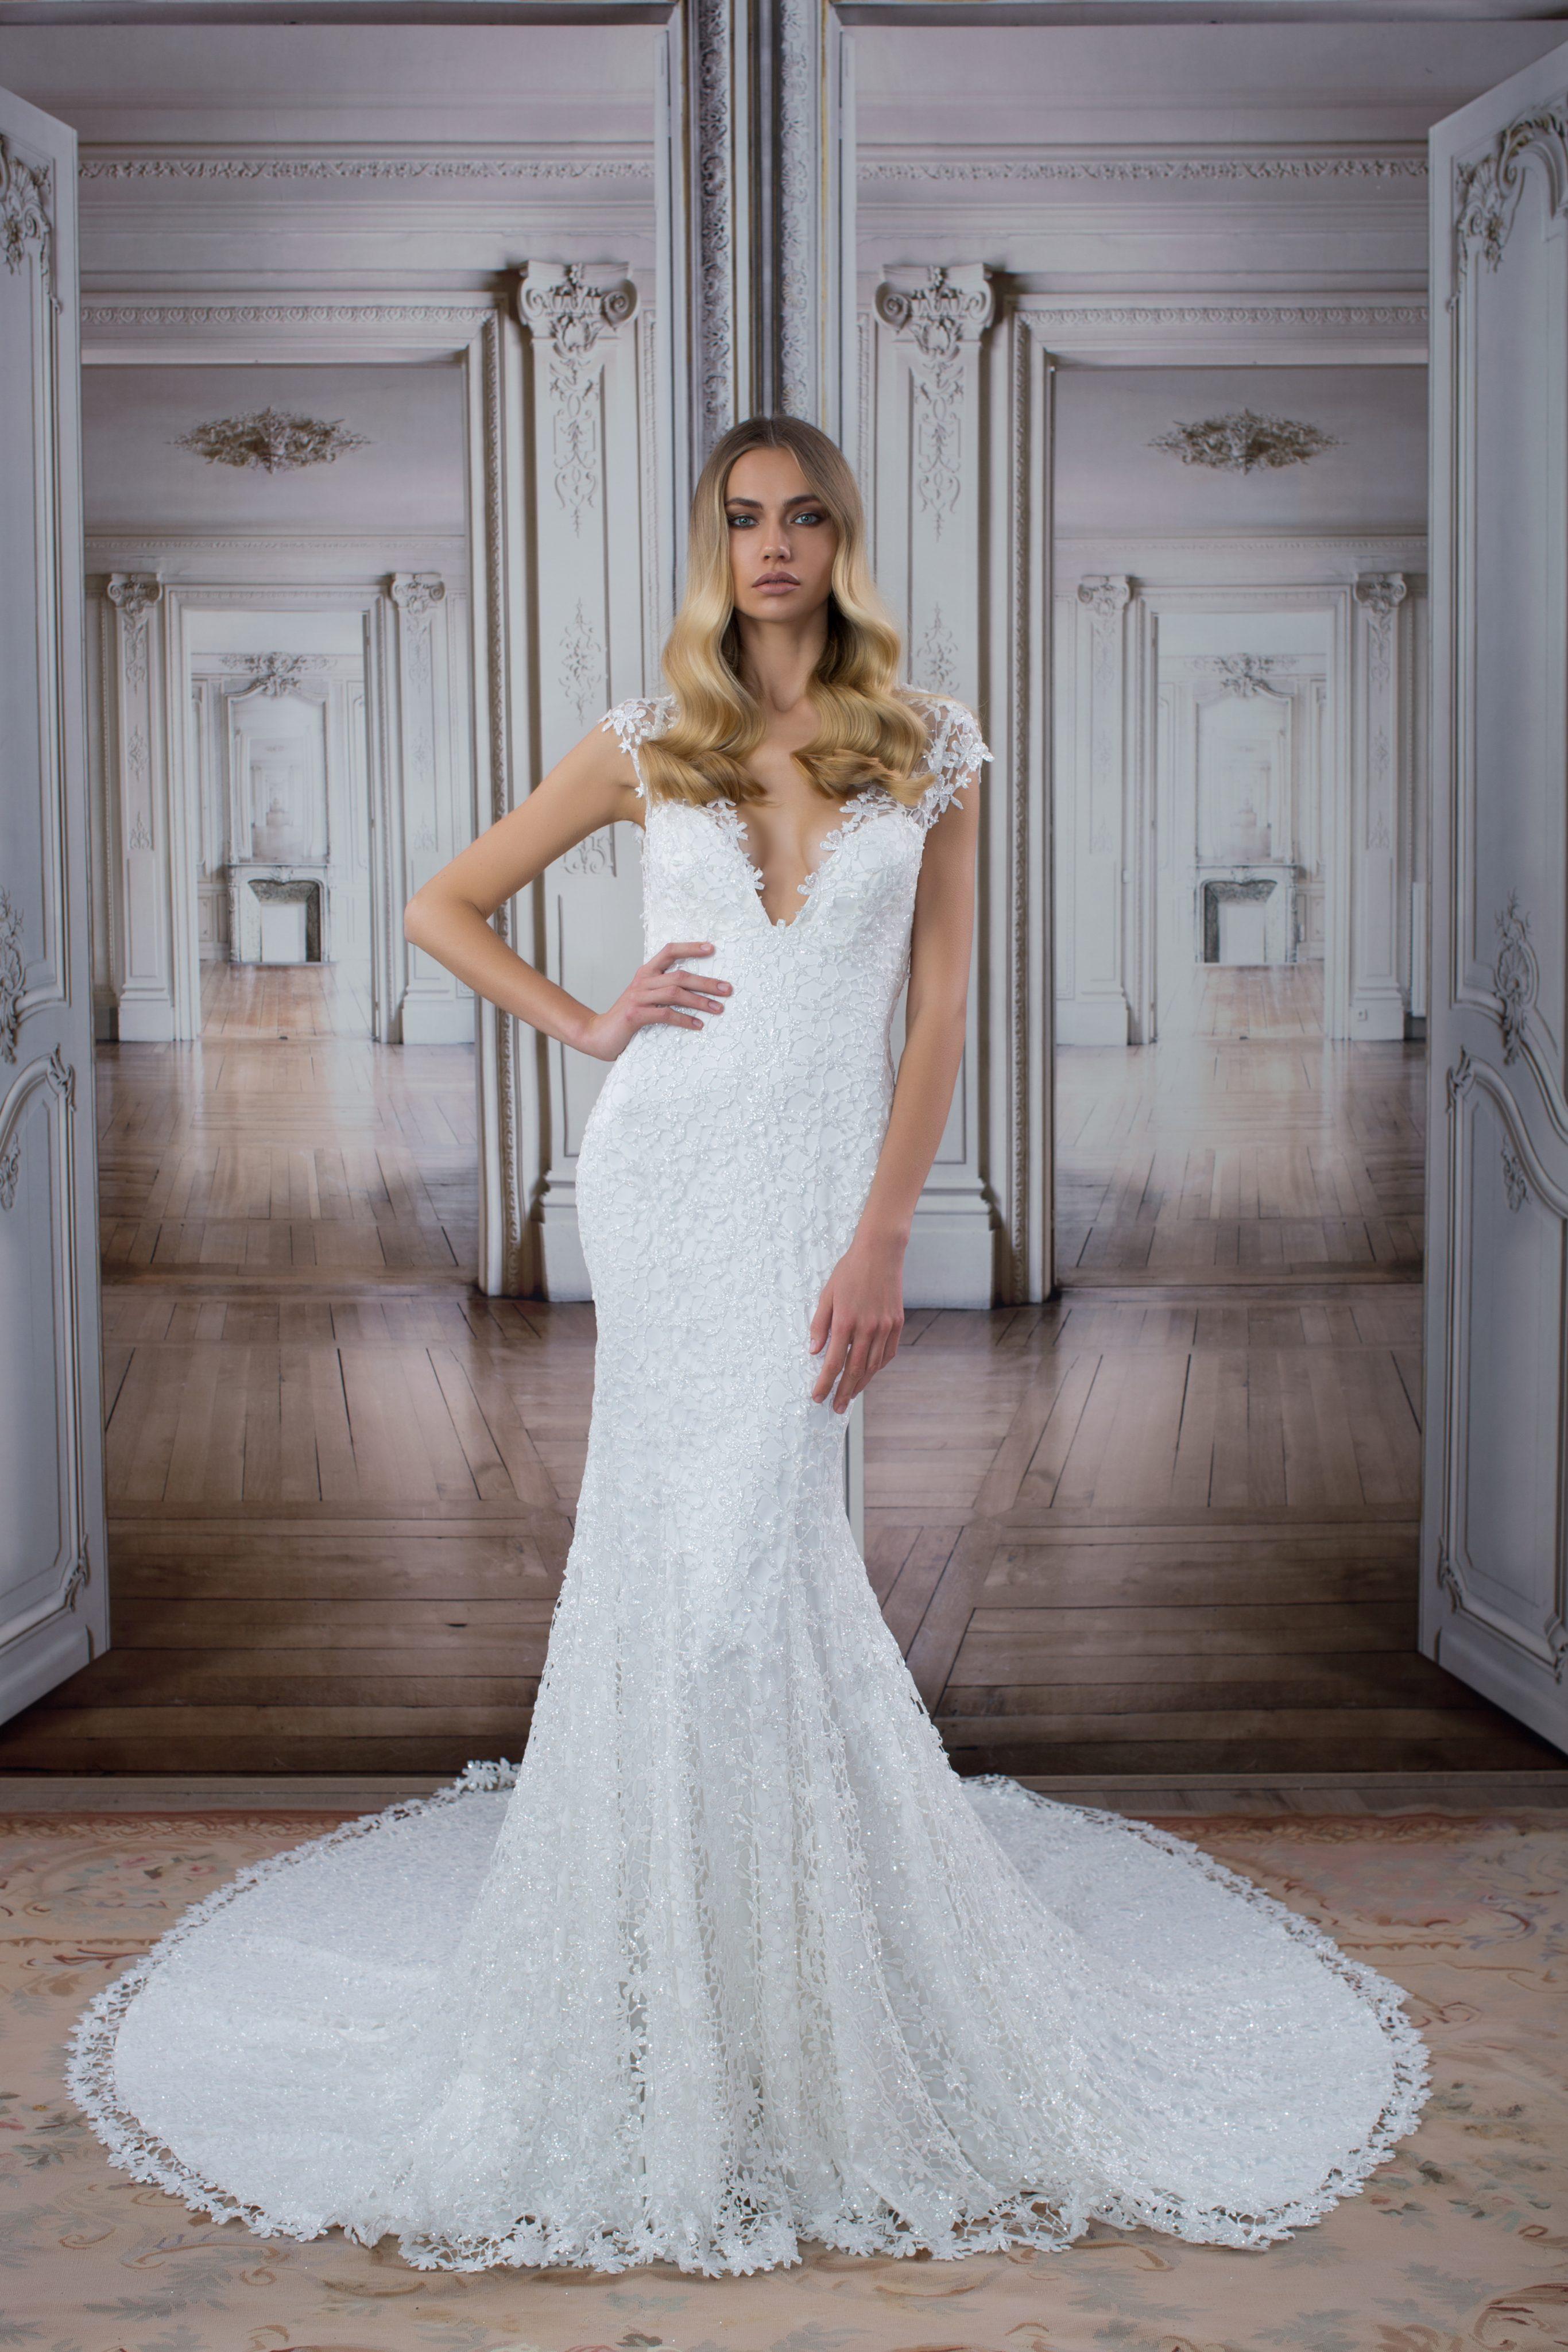 b052d446dd63 Style #14416 · Modern Sheath Wedding Dress by Love by Pnina Tornai